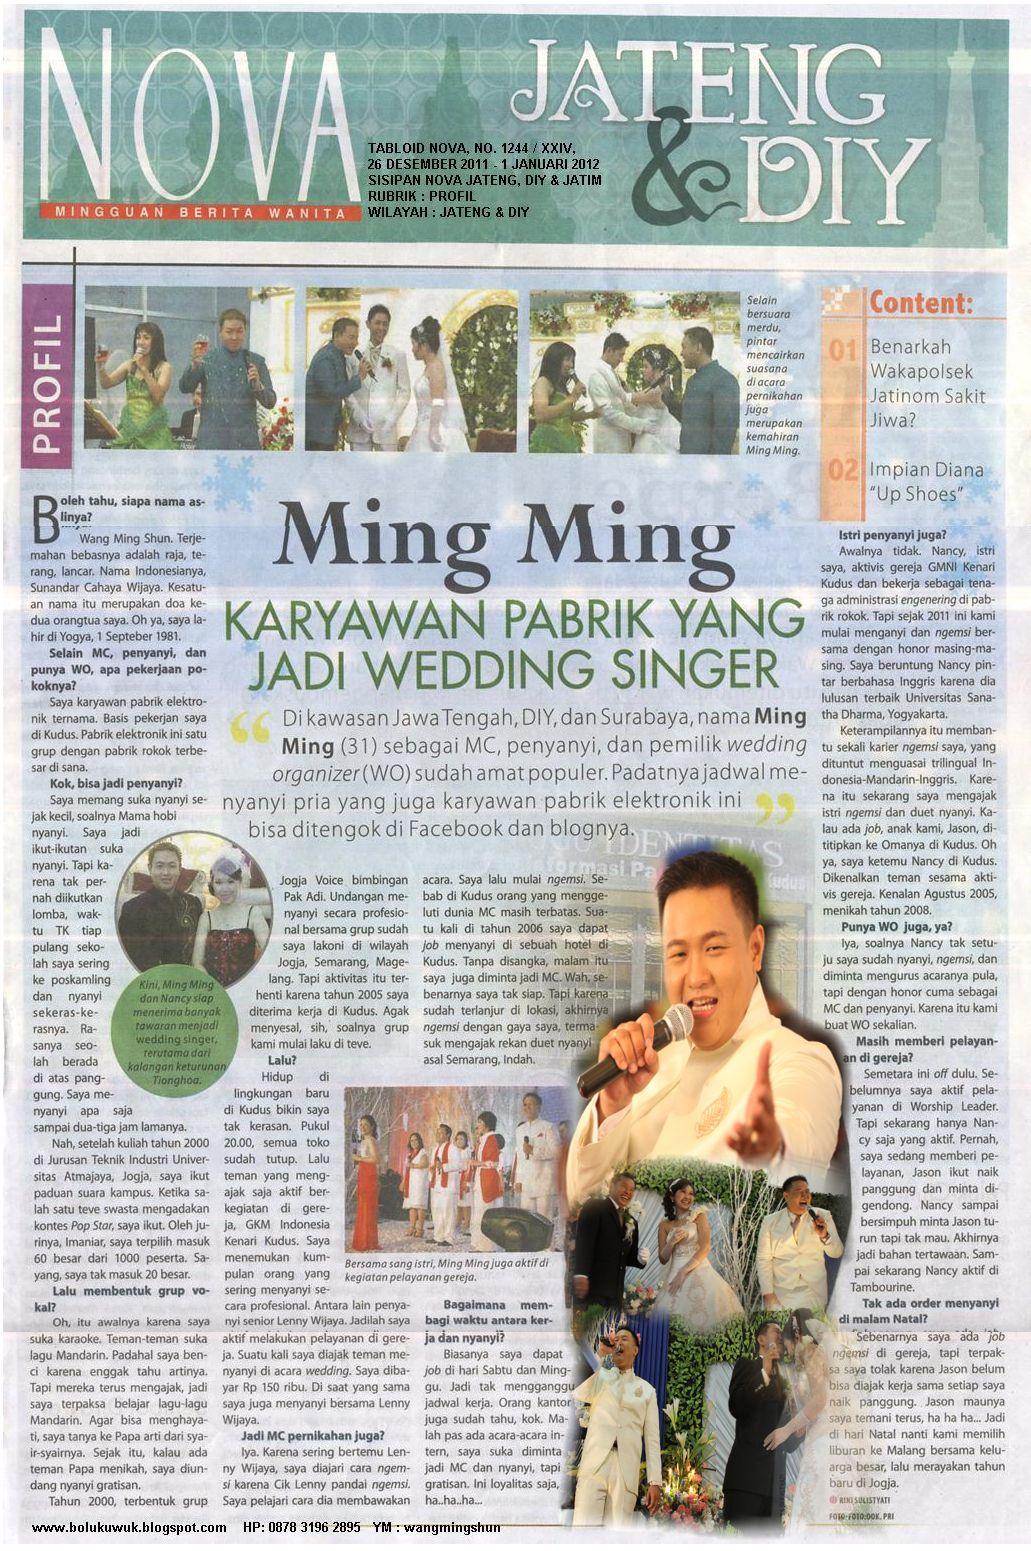 MINGMING KARYAWAN PABRIK YANG JADI WEDDING SINGER